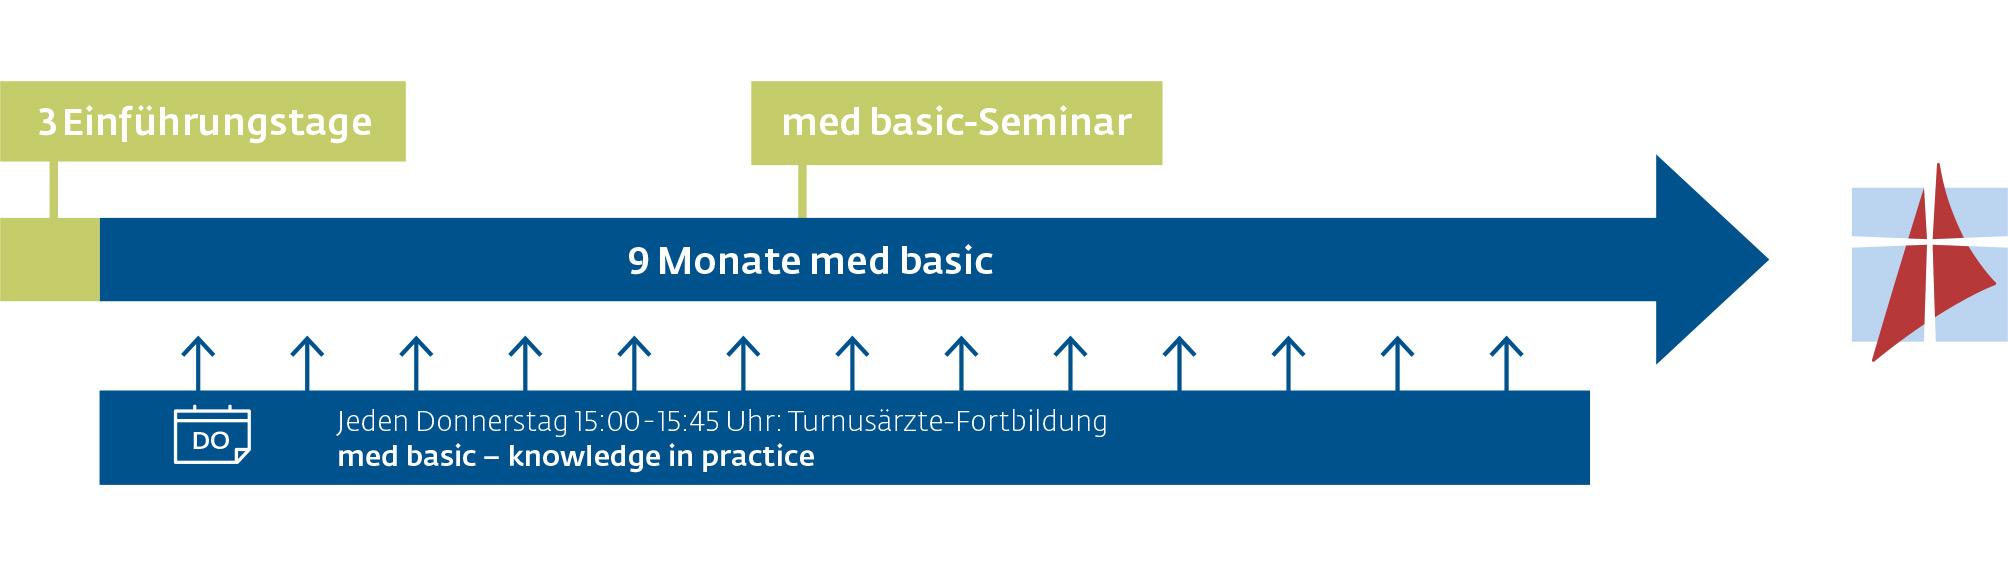 med basic – Basisausbildung Medizin